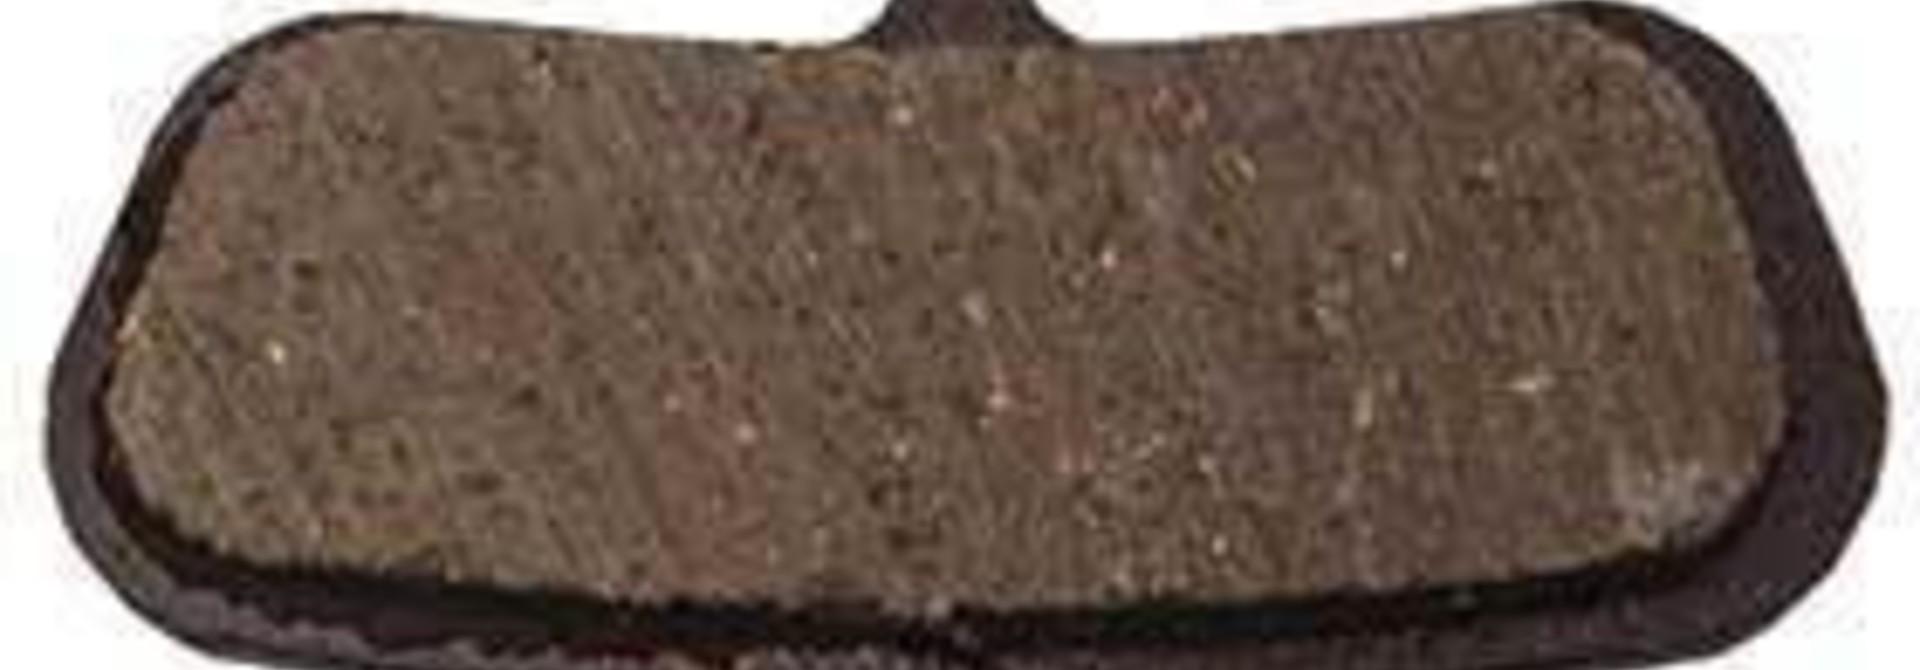 Avid, Code 2007-2010, Disc brake pads, Organic (Quiet), Steel back plate, pair